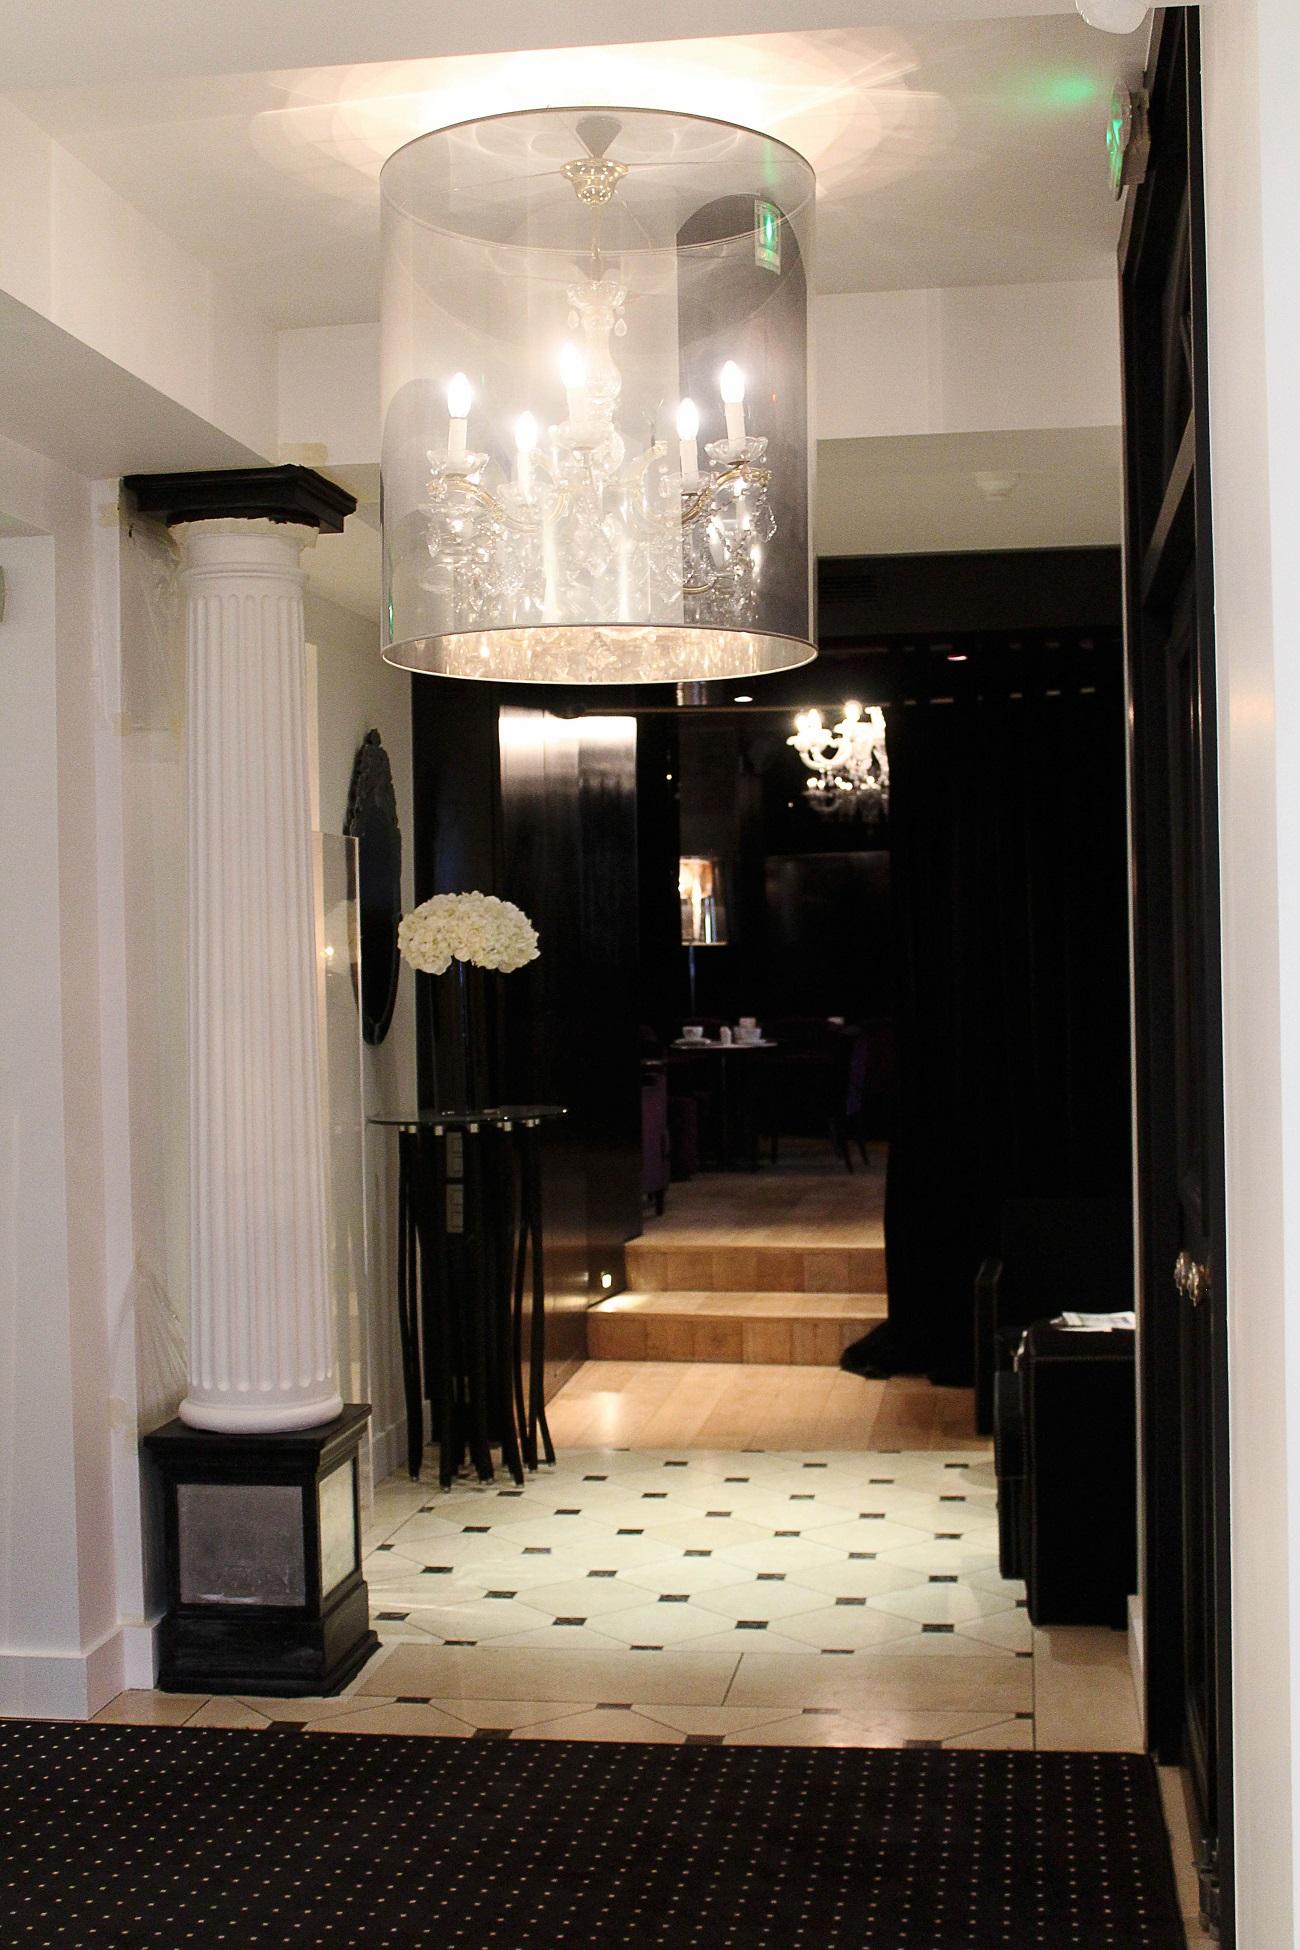 MonHotel_Lounge_and_Spa_Paris_lobby.jpg